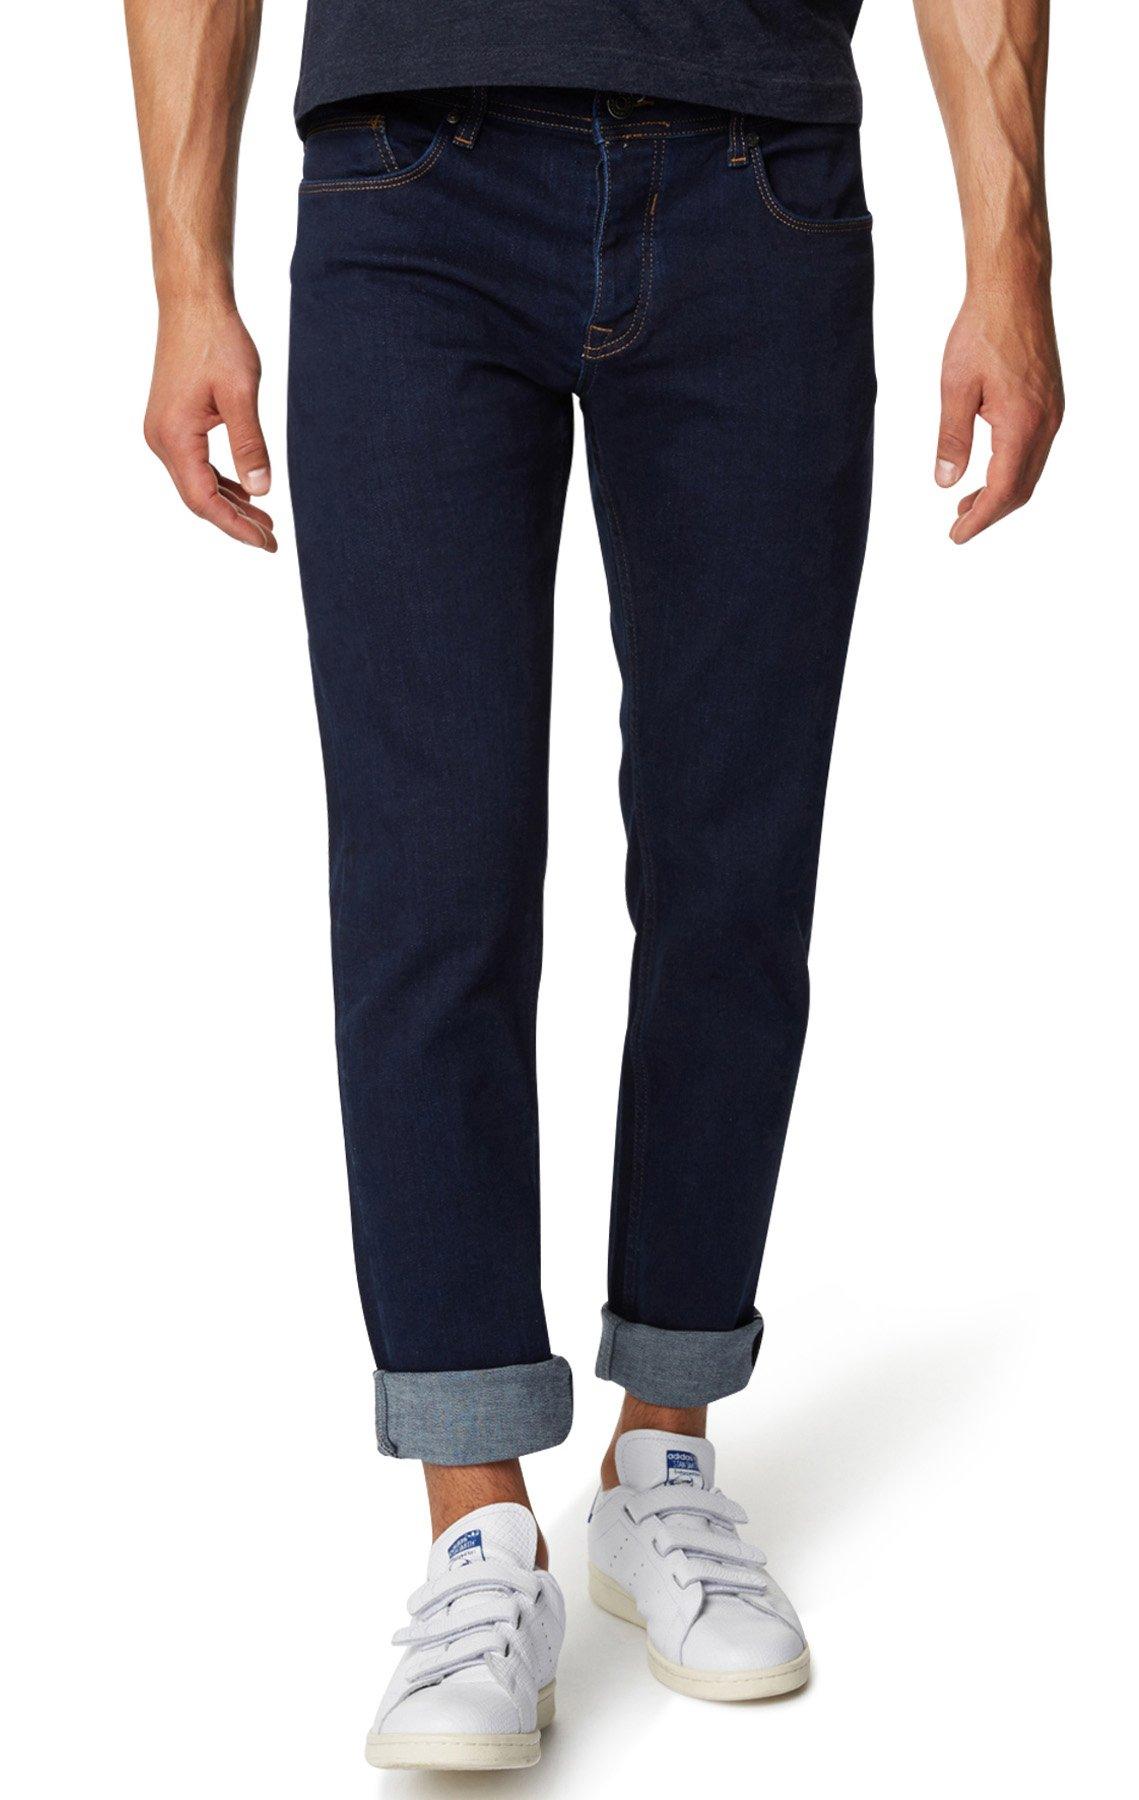 WOTEGA Men's Jeans Alistar, peacoat (3920), W38/L32